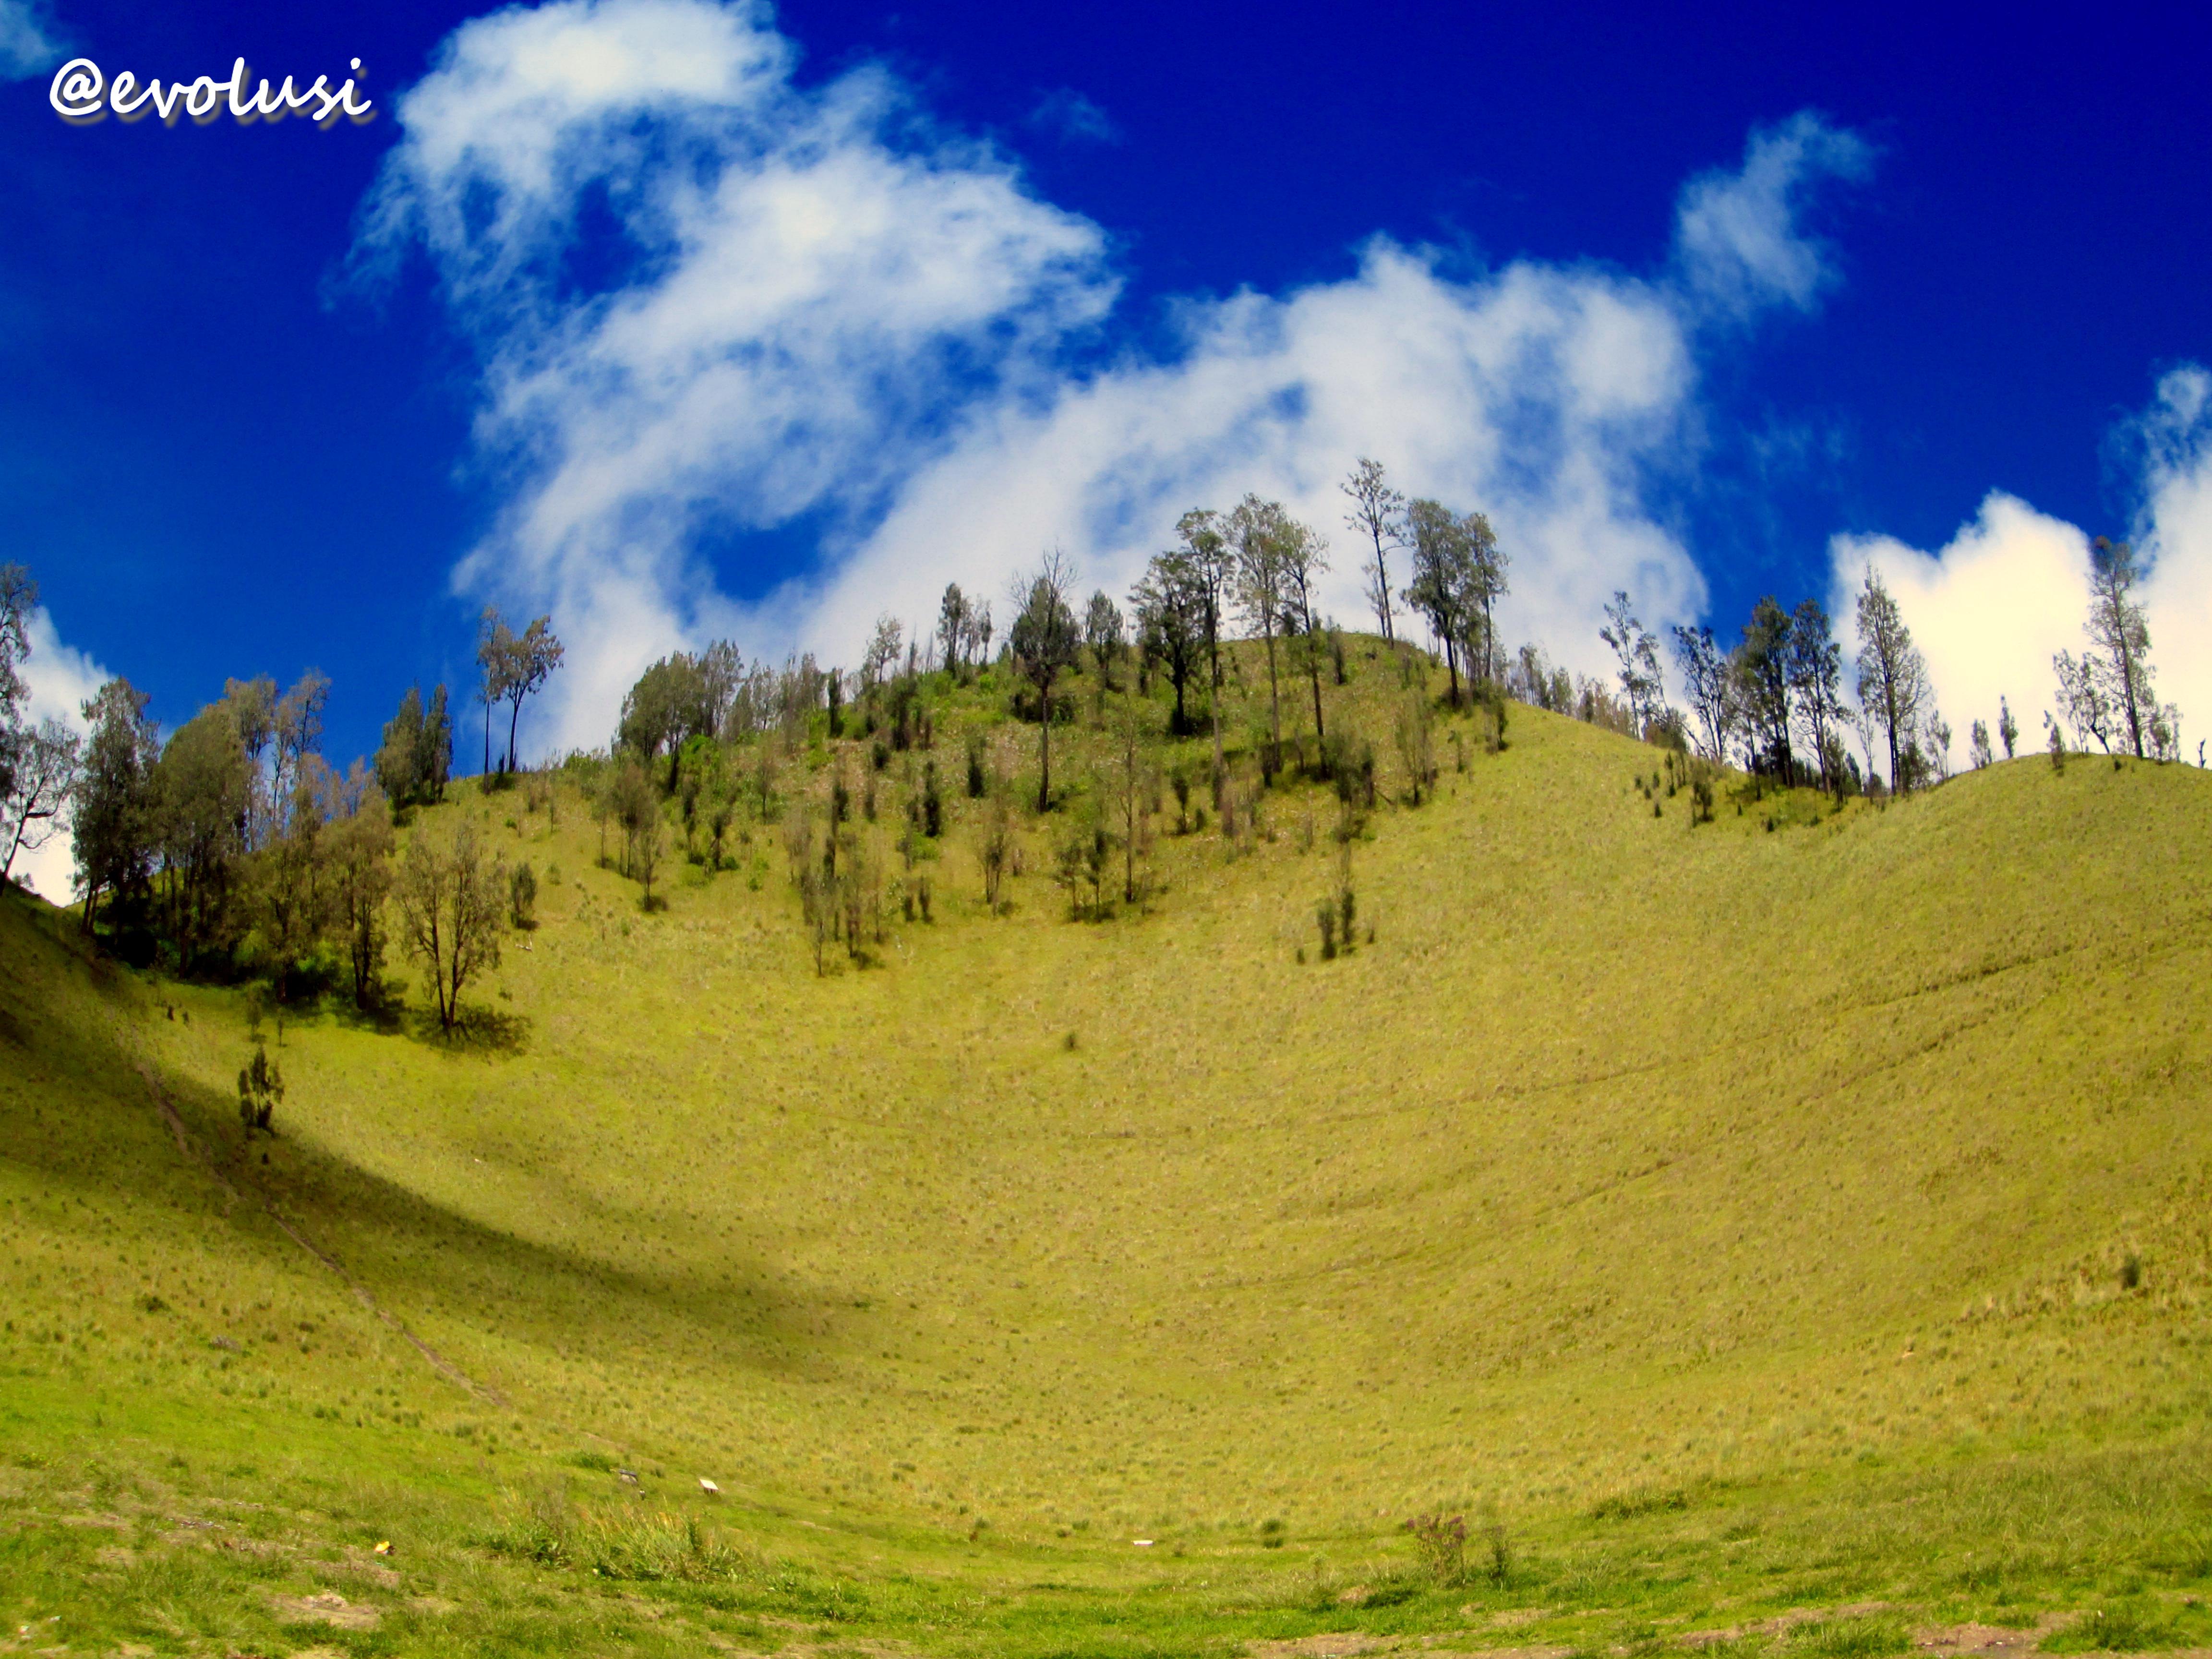 Gunung Semeru Keindahan Sejarah Legenda Dan Cerita E Note